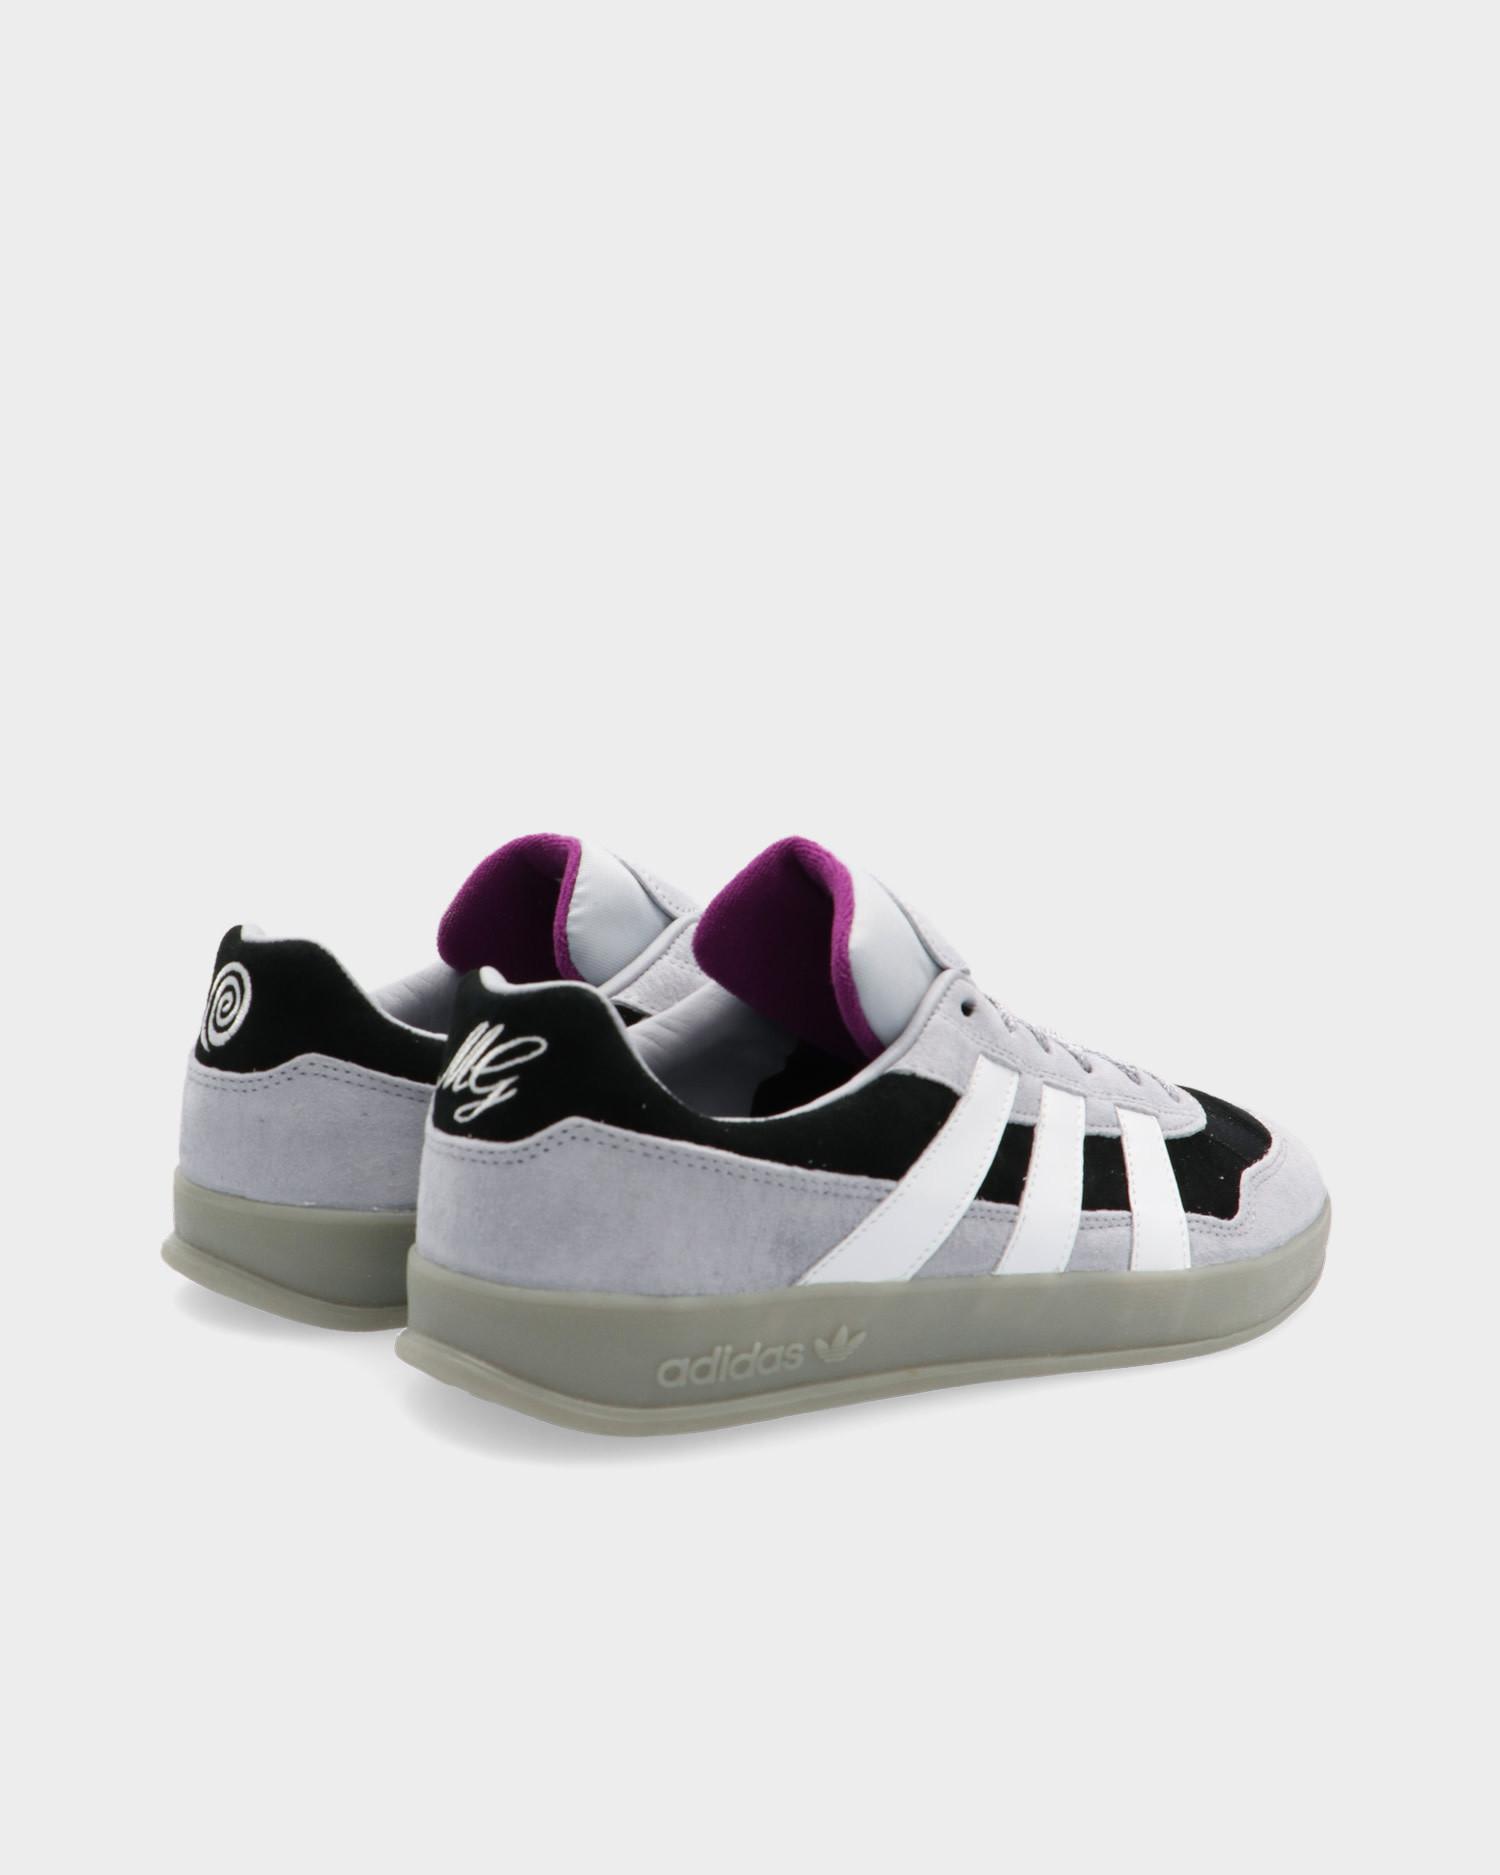 Adidas Aloha Super HalSil/FtwWht/Cblack